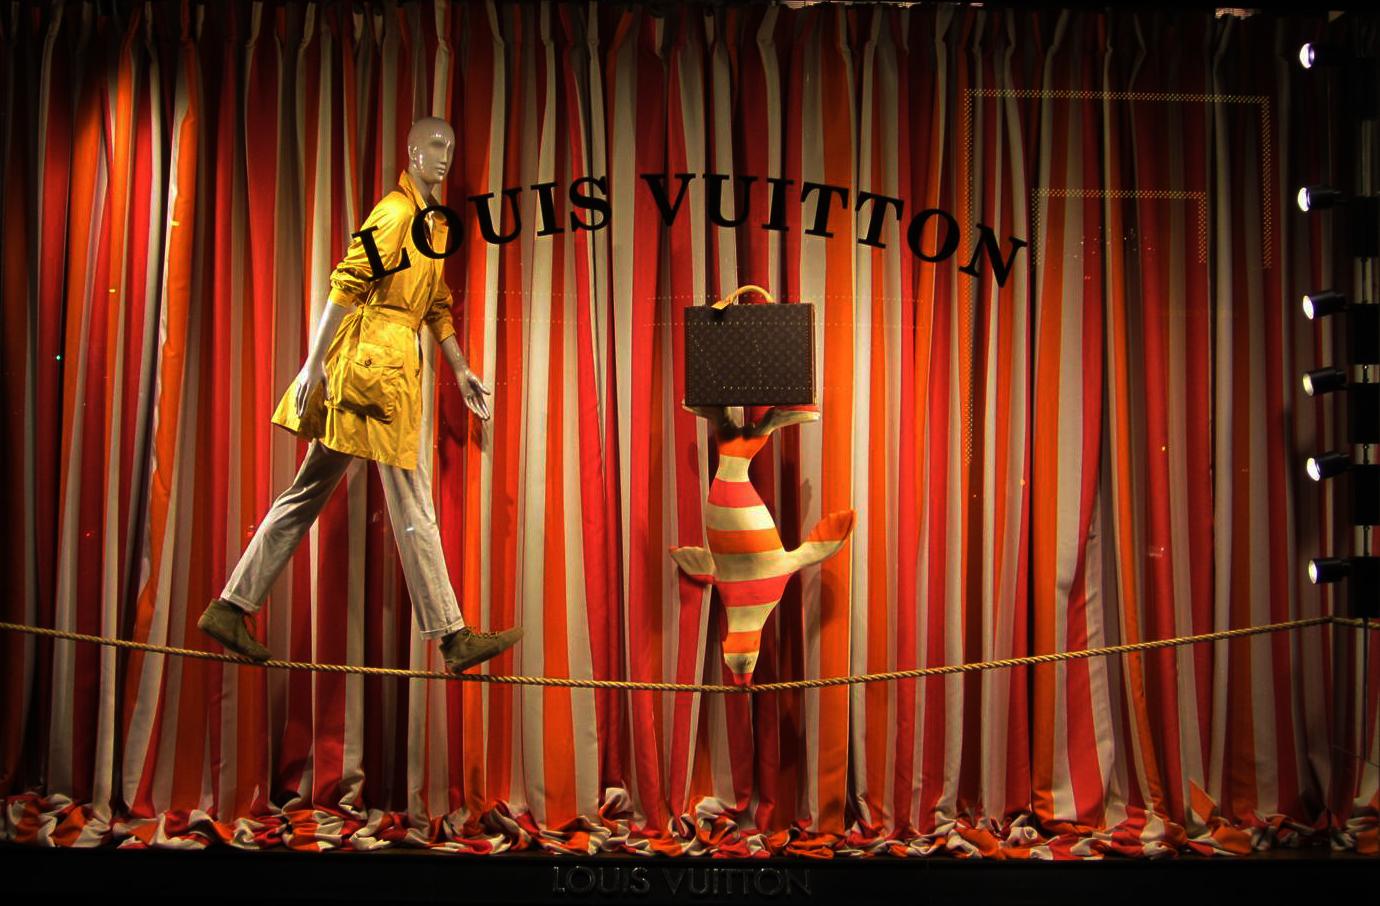 Vetrine originali - Louis Vuitton [fonte: circusgirlmagazine.com]